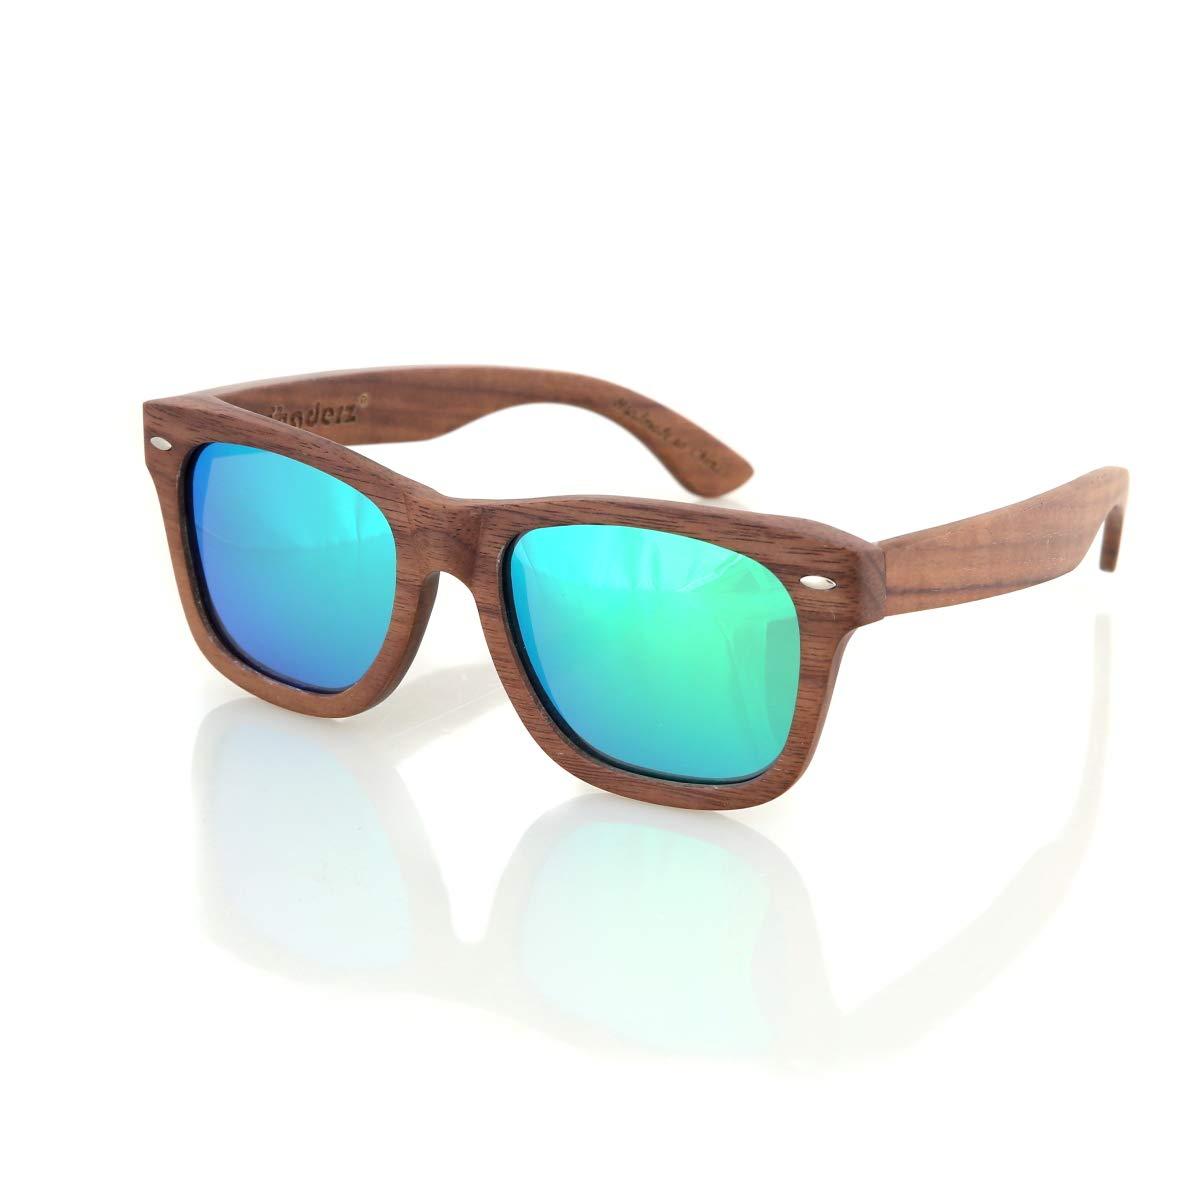 Amazon.com: Madera de Nogal de madera marcos polarizadas ...